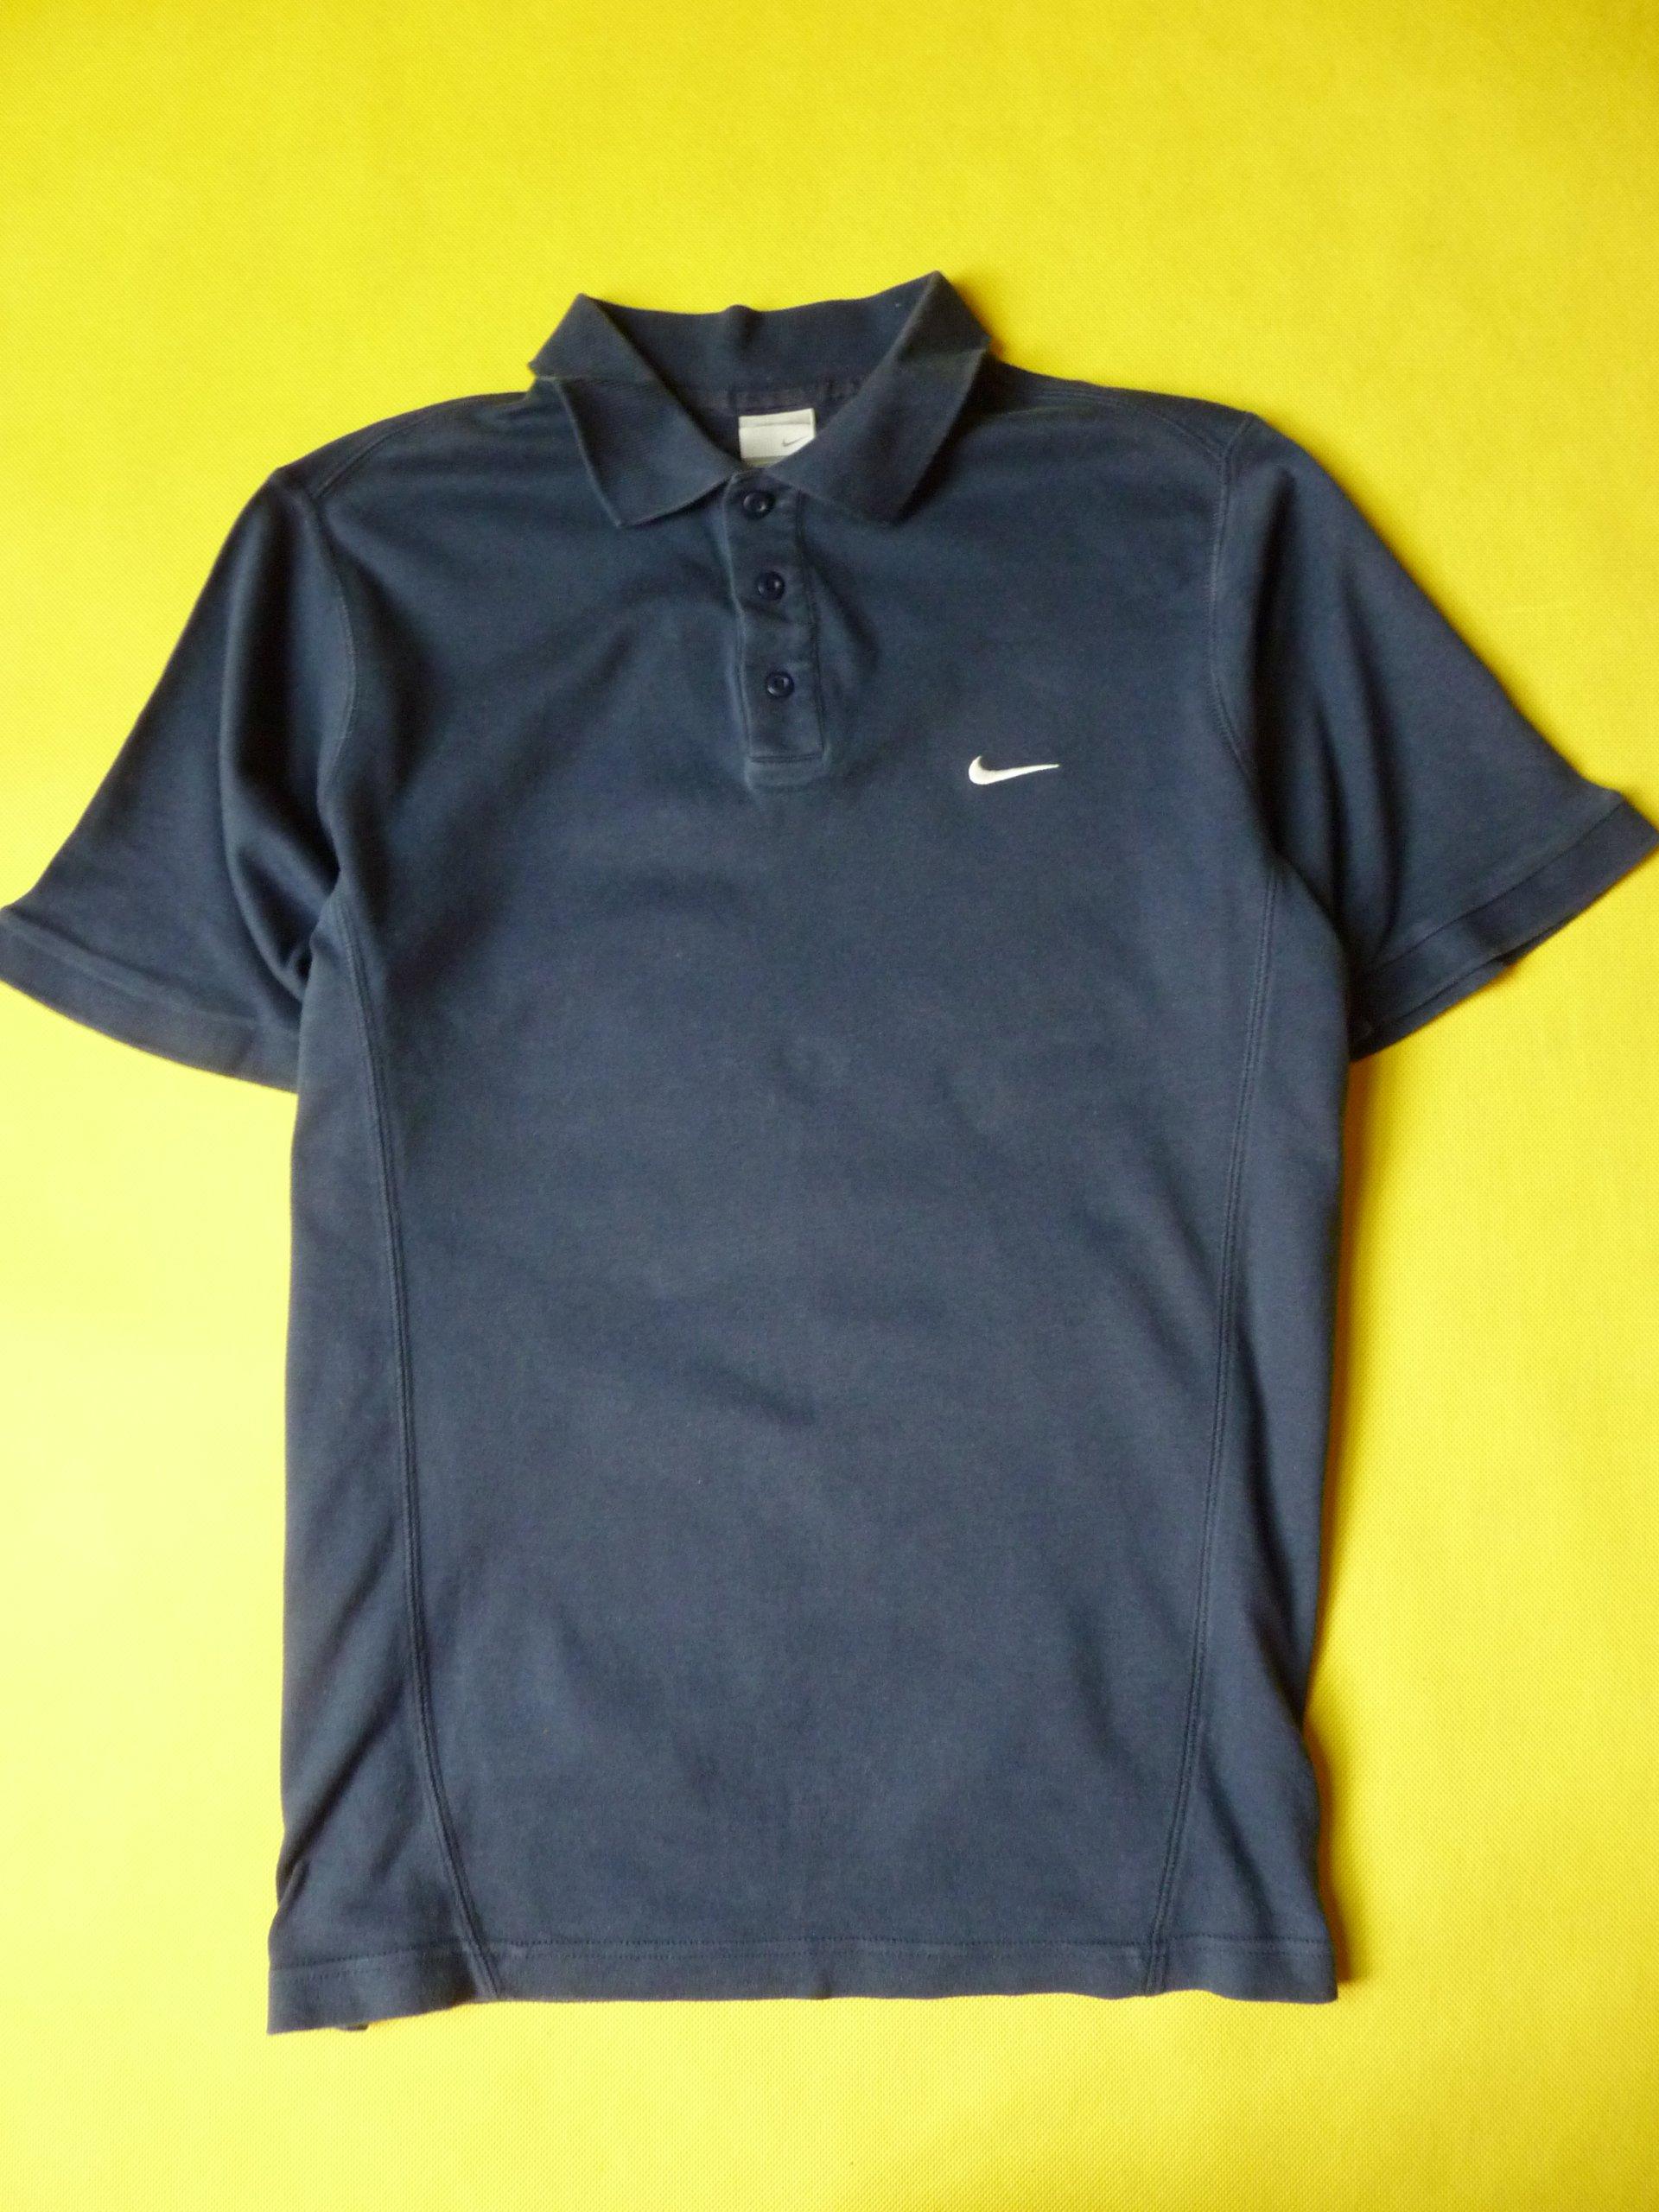 f9e4933b0 NIKE koszulka męska polo r S ok 173 cm - 7274937142 - oficjalne ...